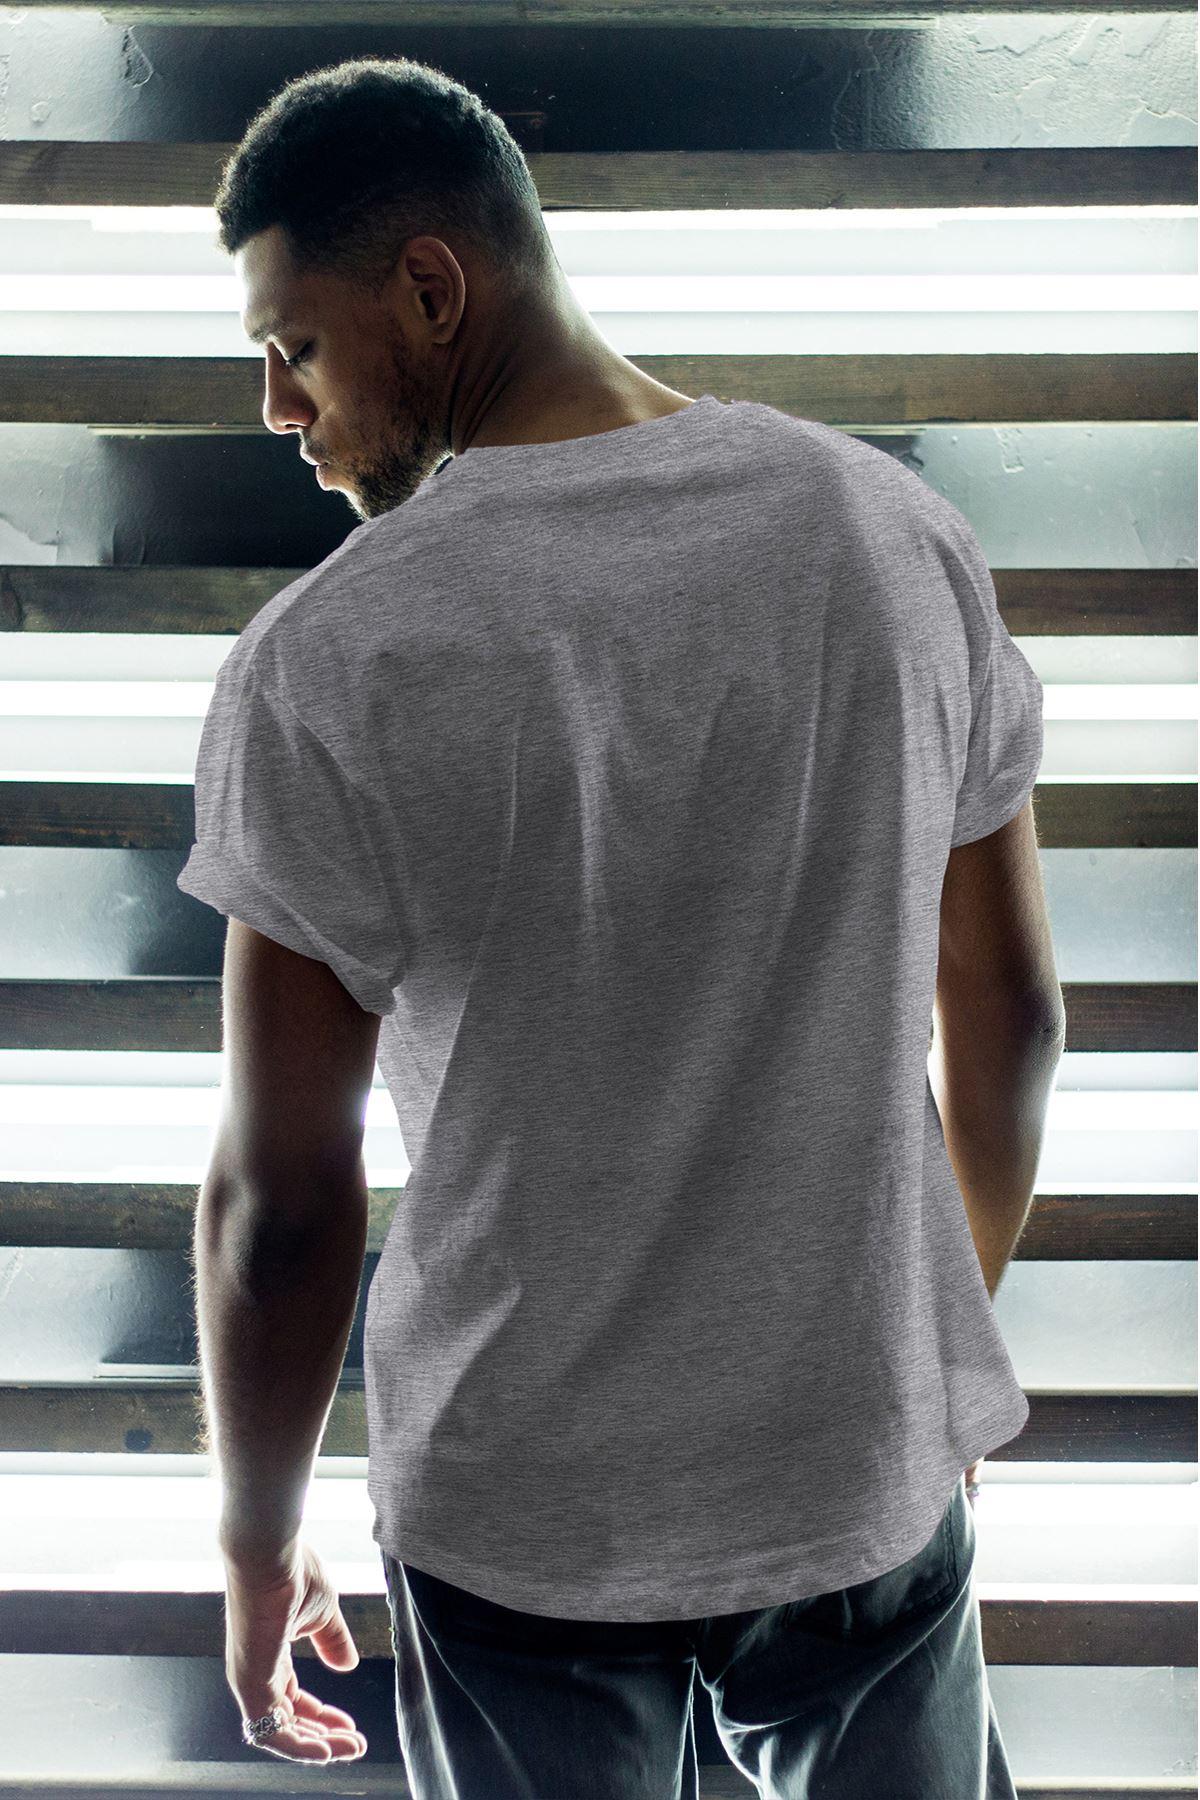 Boston Celtics 29 Gri Erkek Oversize Tshirt - Tişört